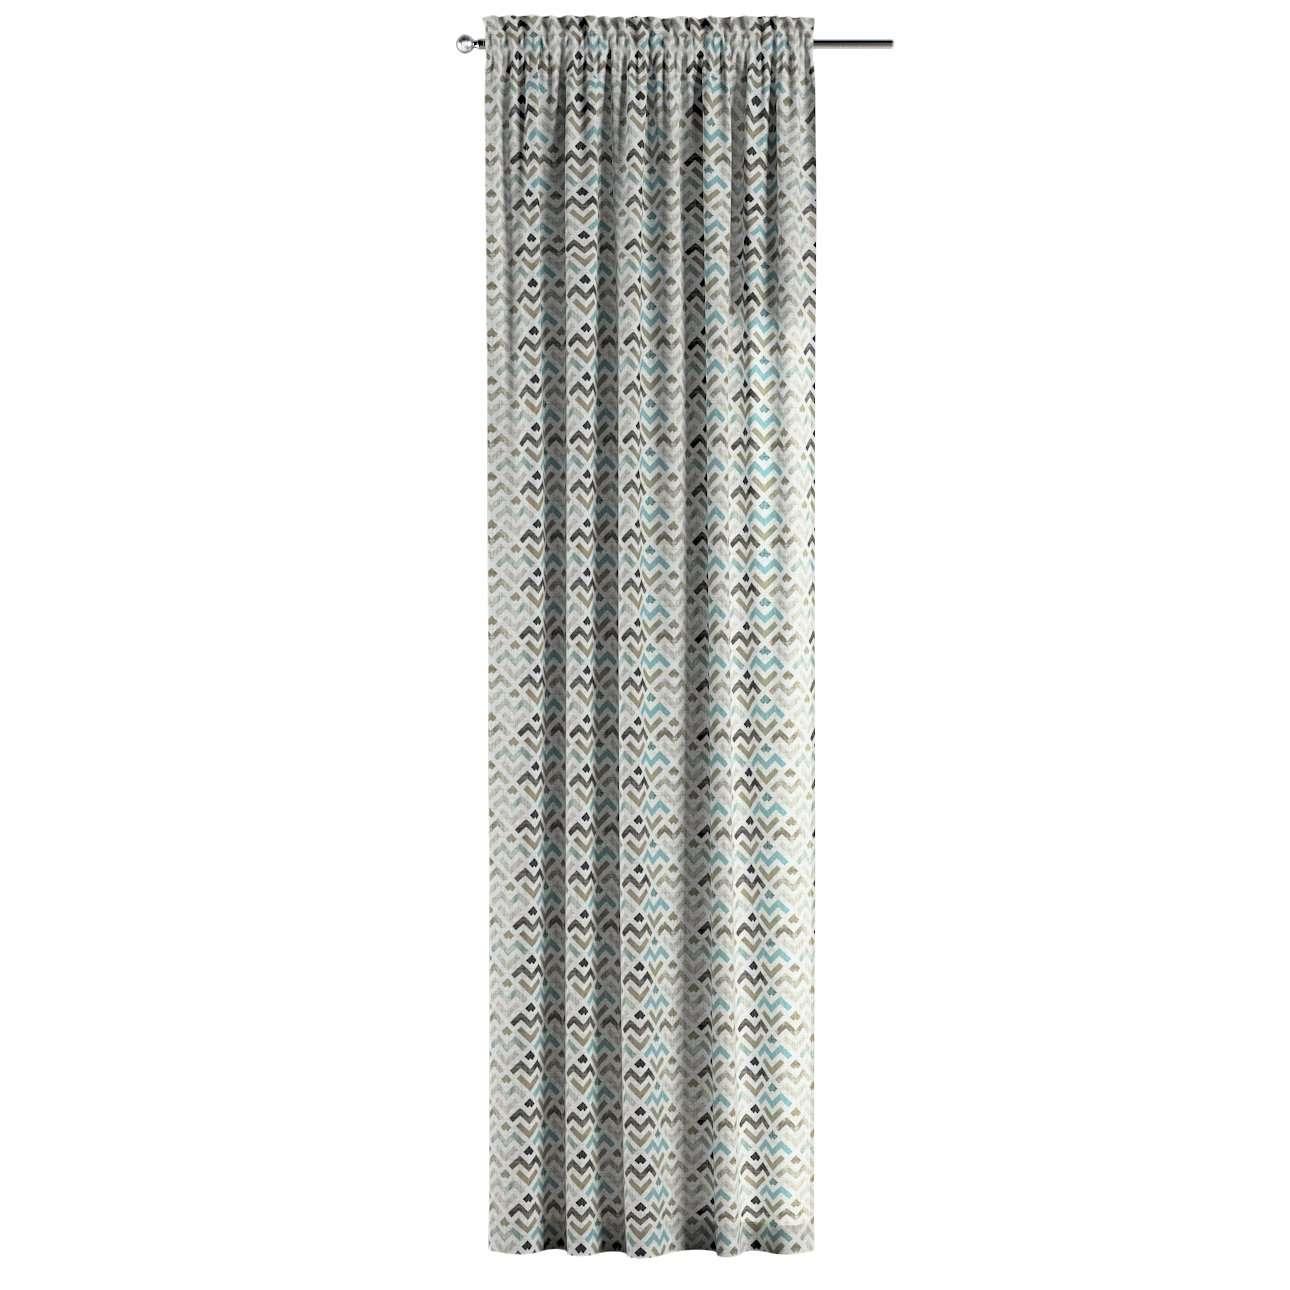 Gardin med løbegang - multibånd 1 stk. fra kollektionen Modern, Stof: 141-93